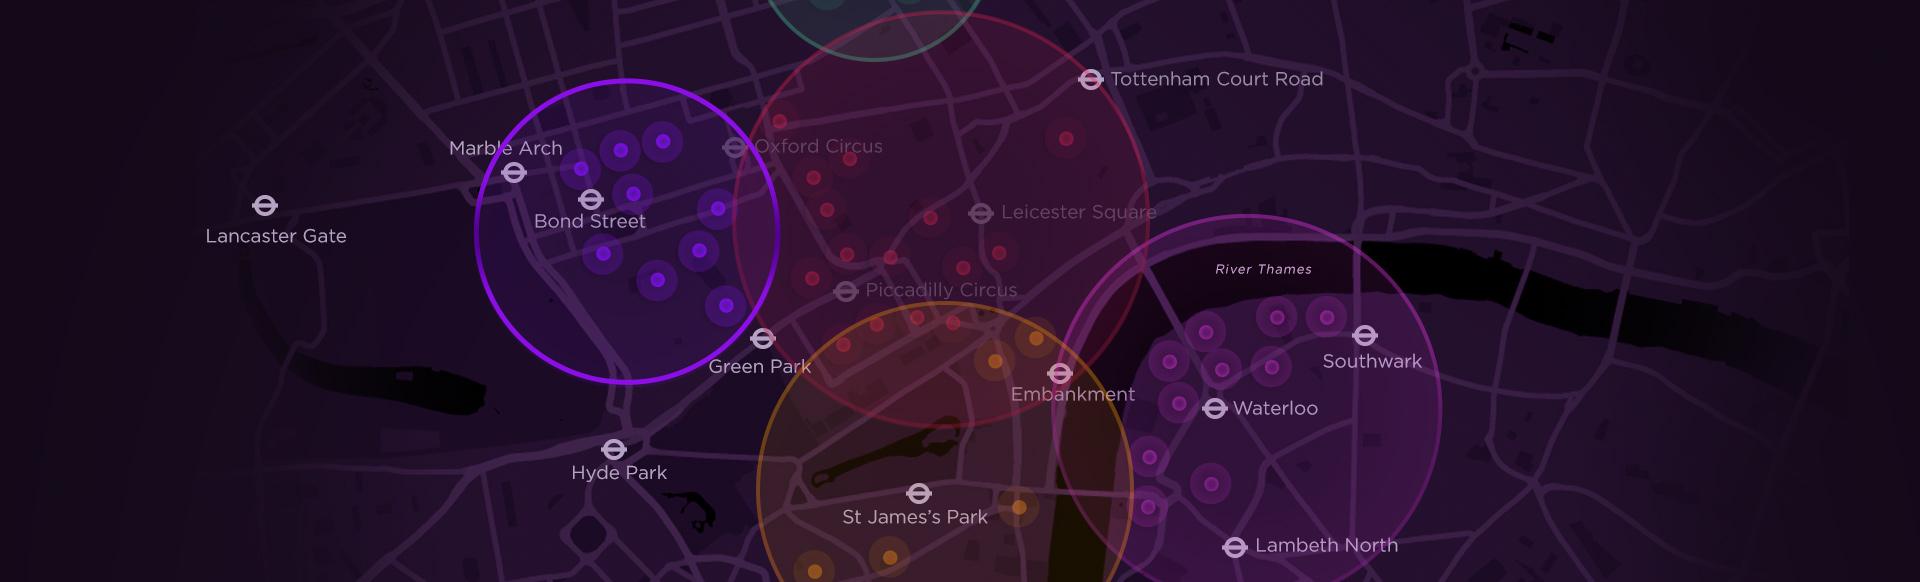 Marble Arch London Map.Lumiere London 2018 Mayfair Visitlondon Com